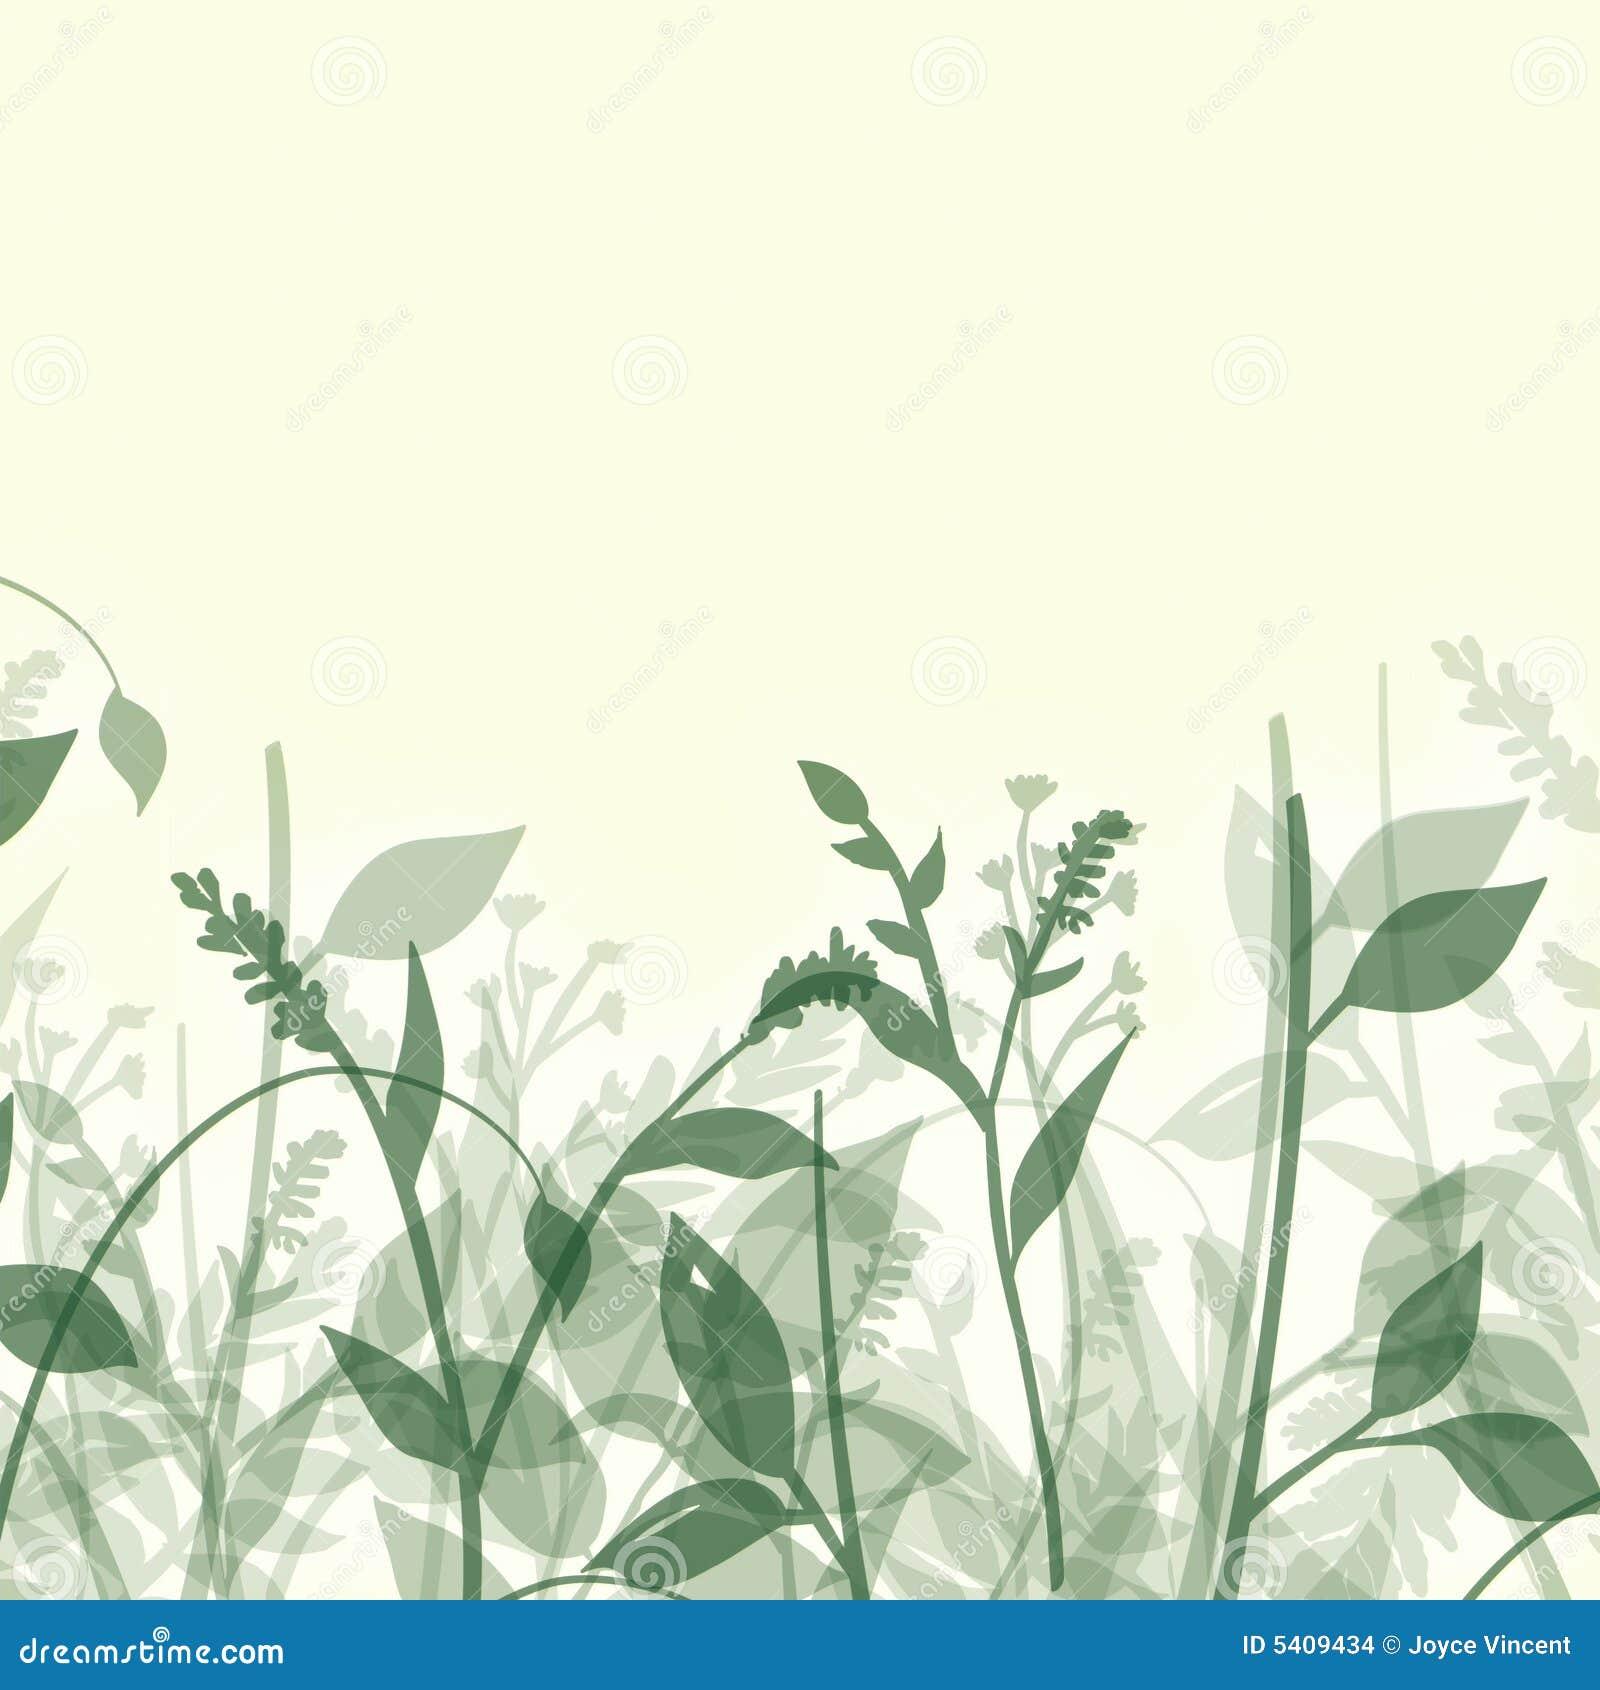 Plants Abstract Stock Illustration Illustration Of Background 5409434